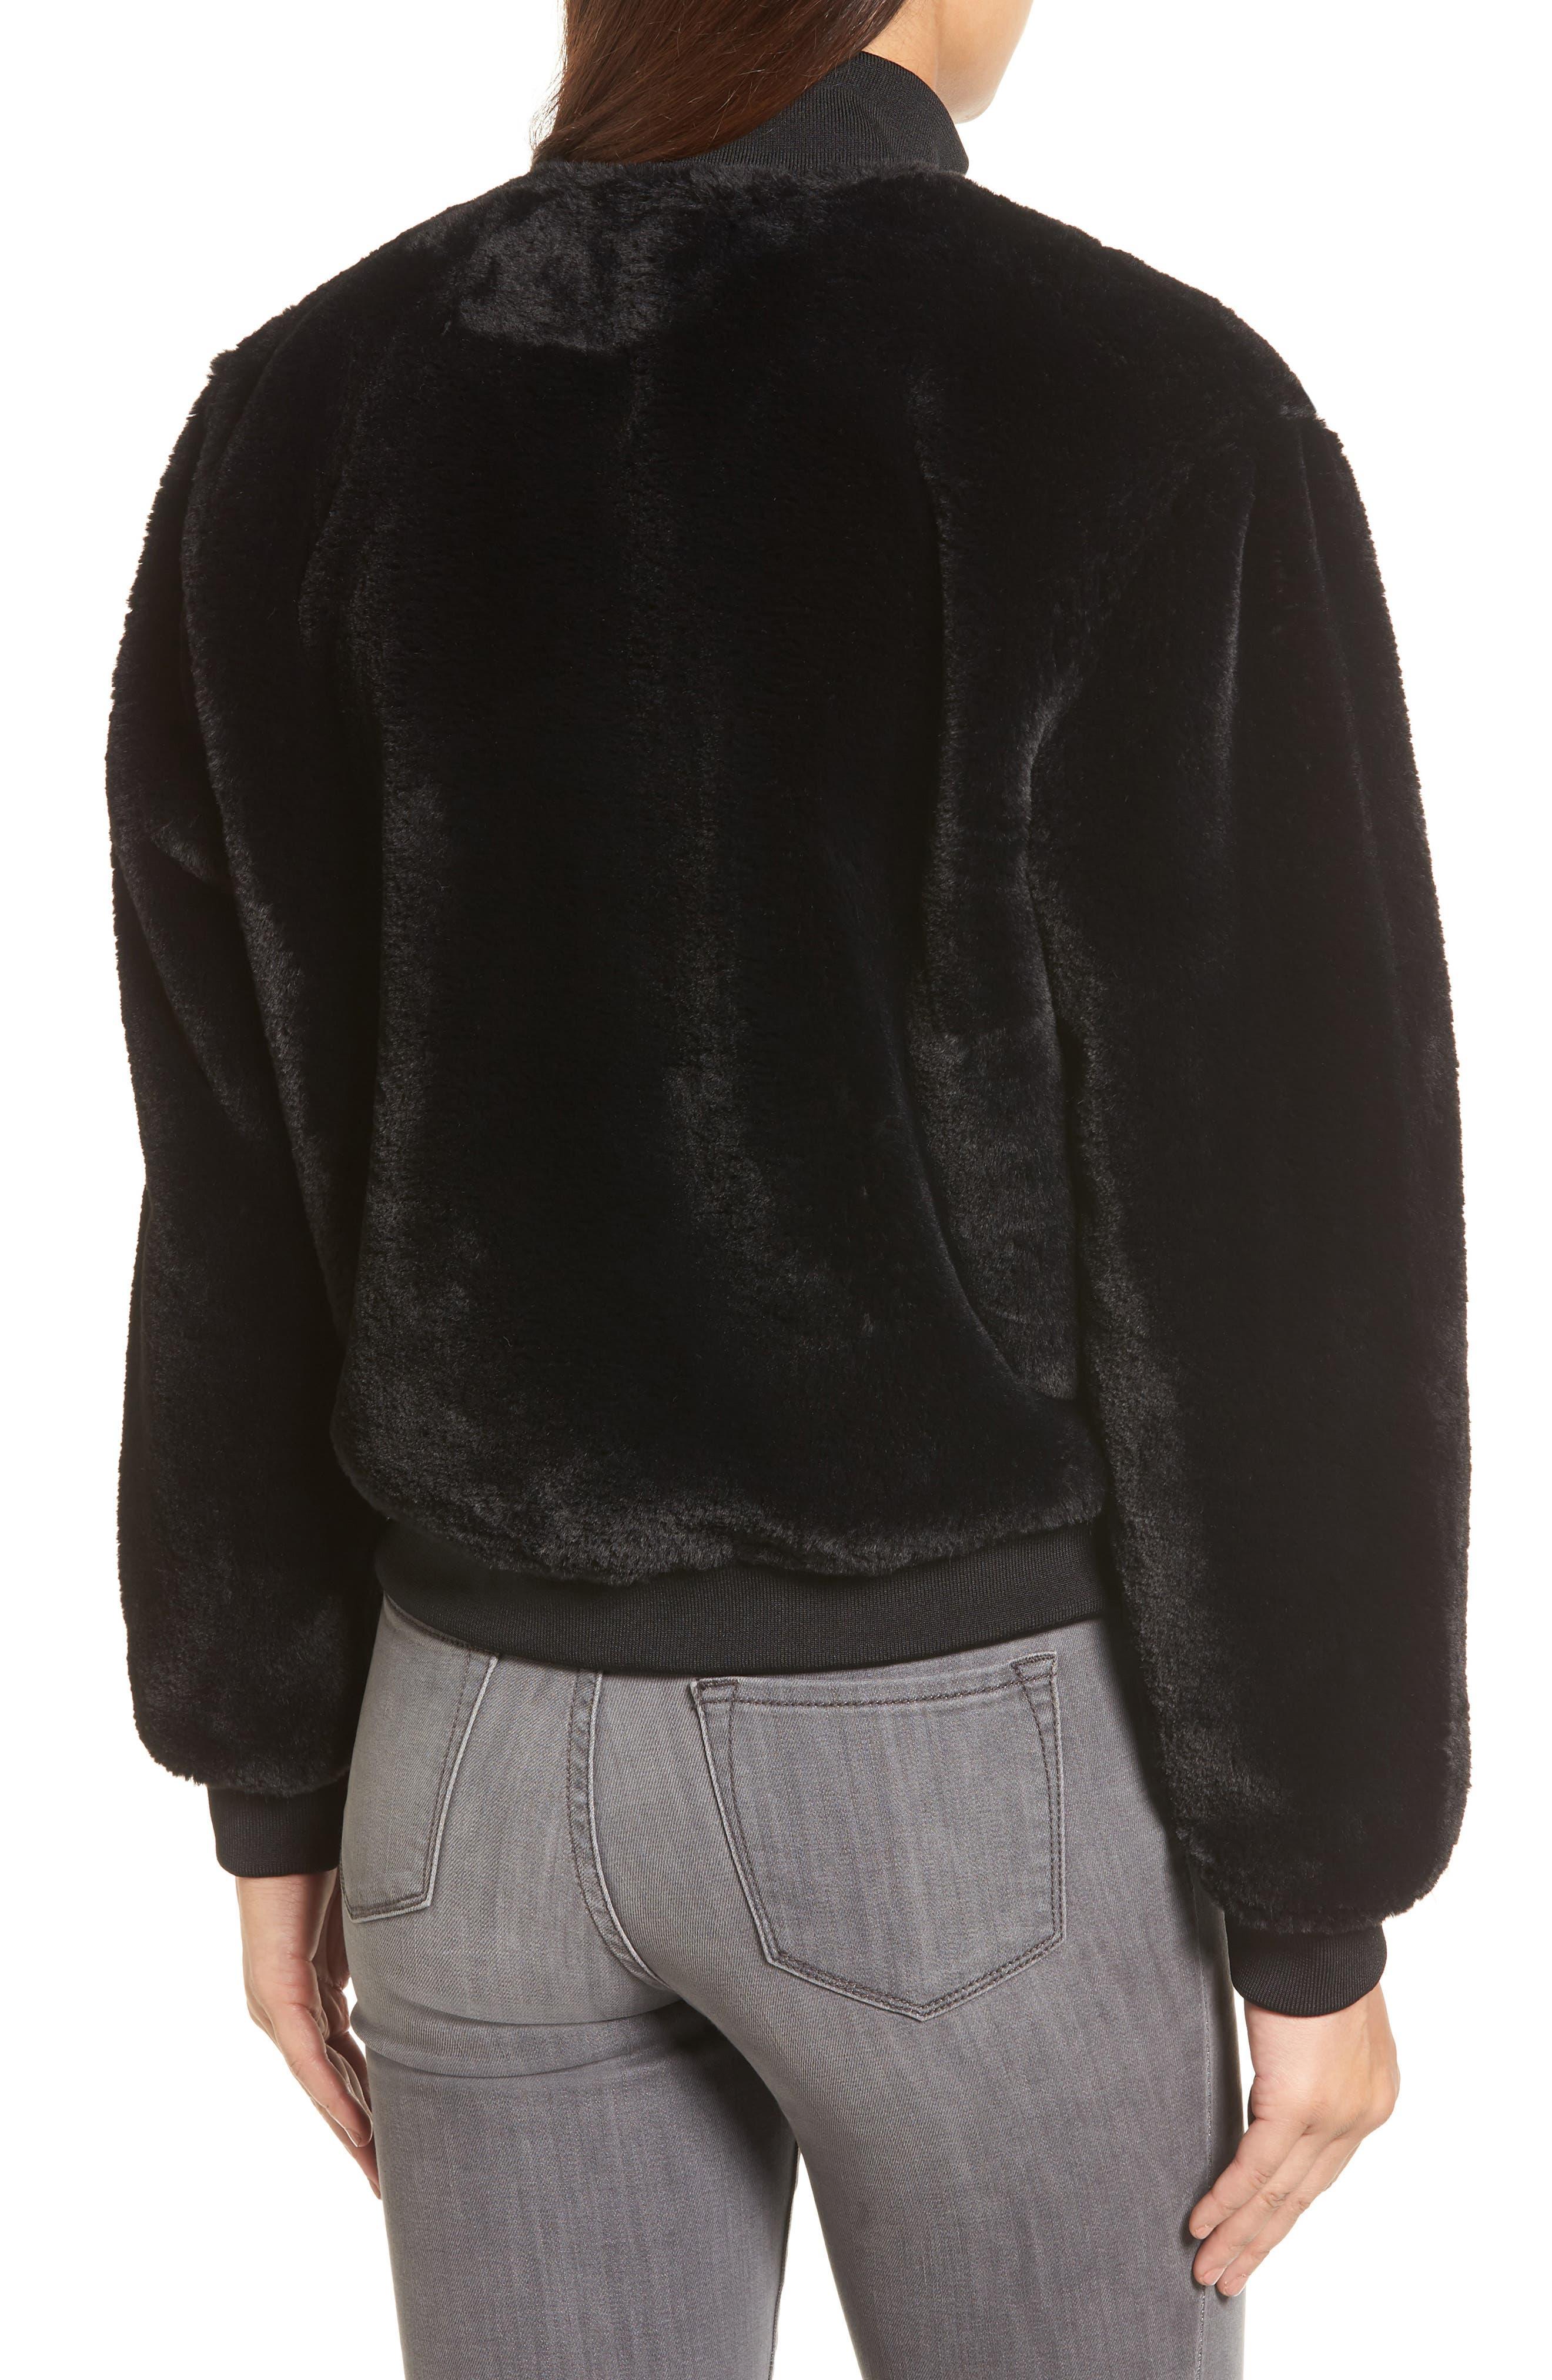 KENNETH COLE NEW YORK, Half-Zip Faux Fur Sweatshirt, Alternate thumbnail 2, color, BLACK